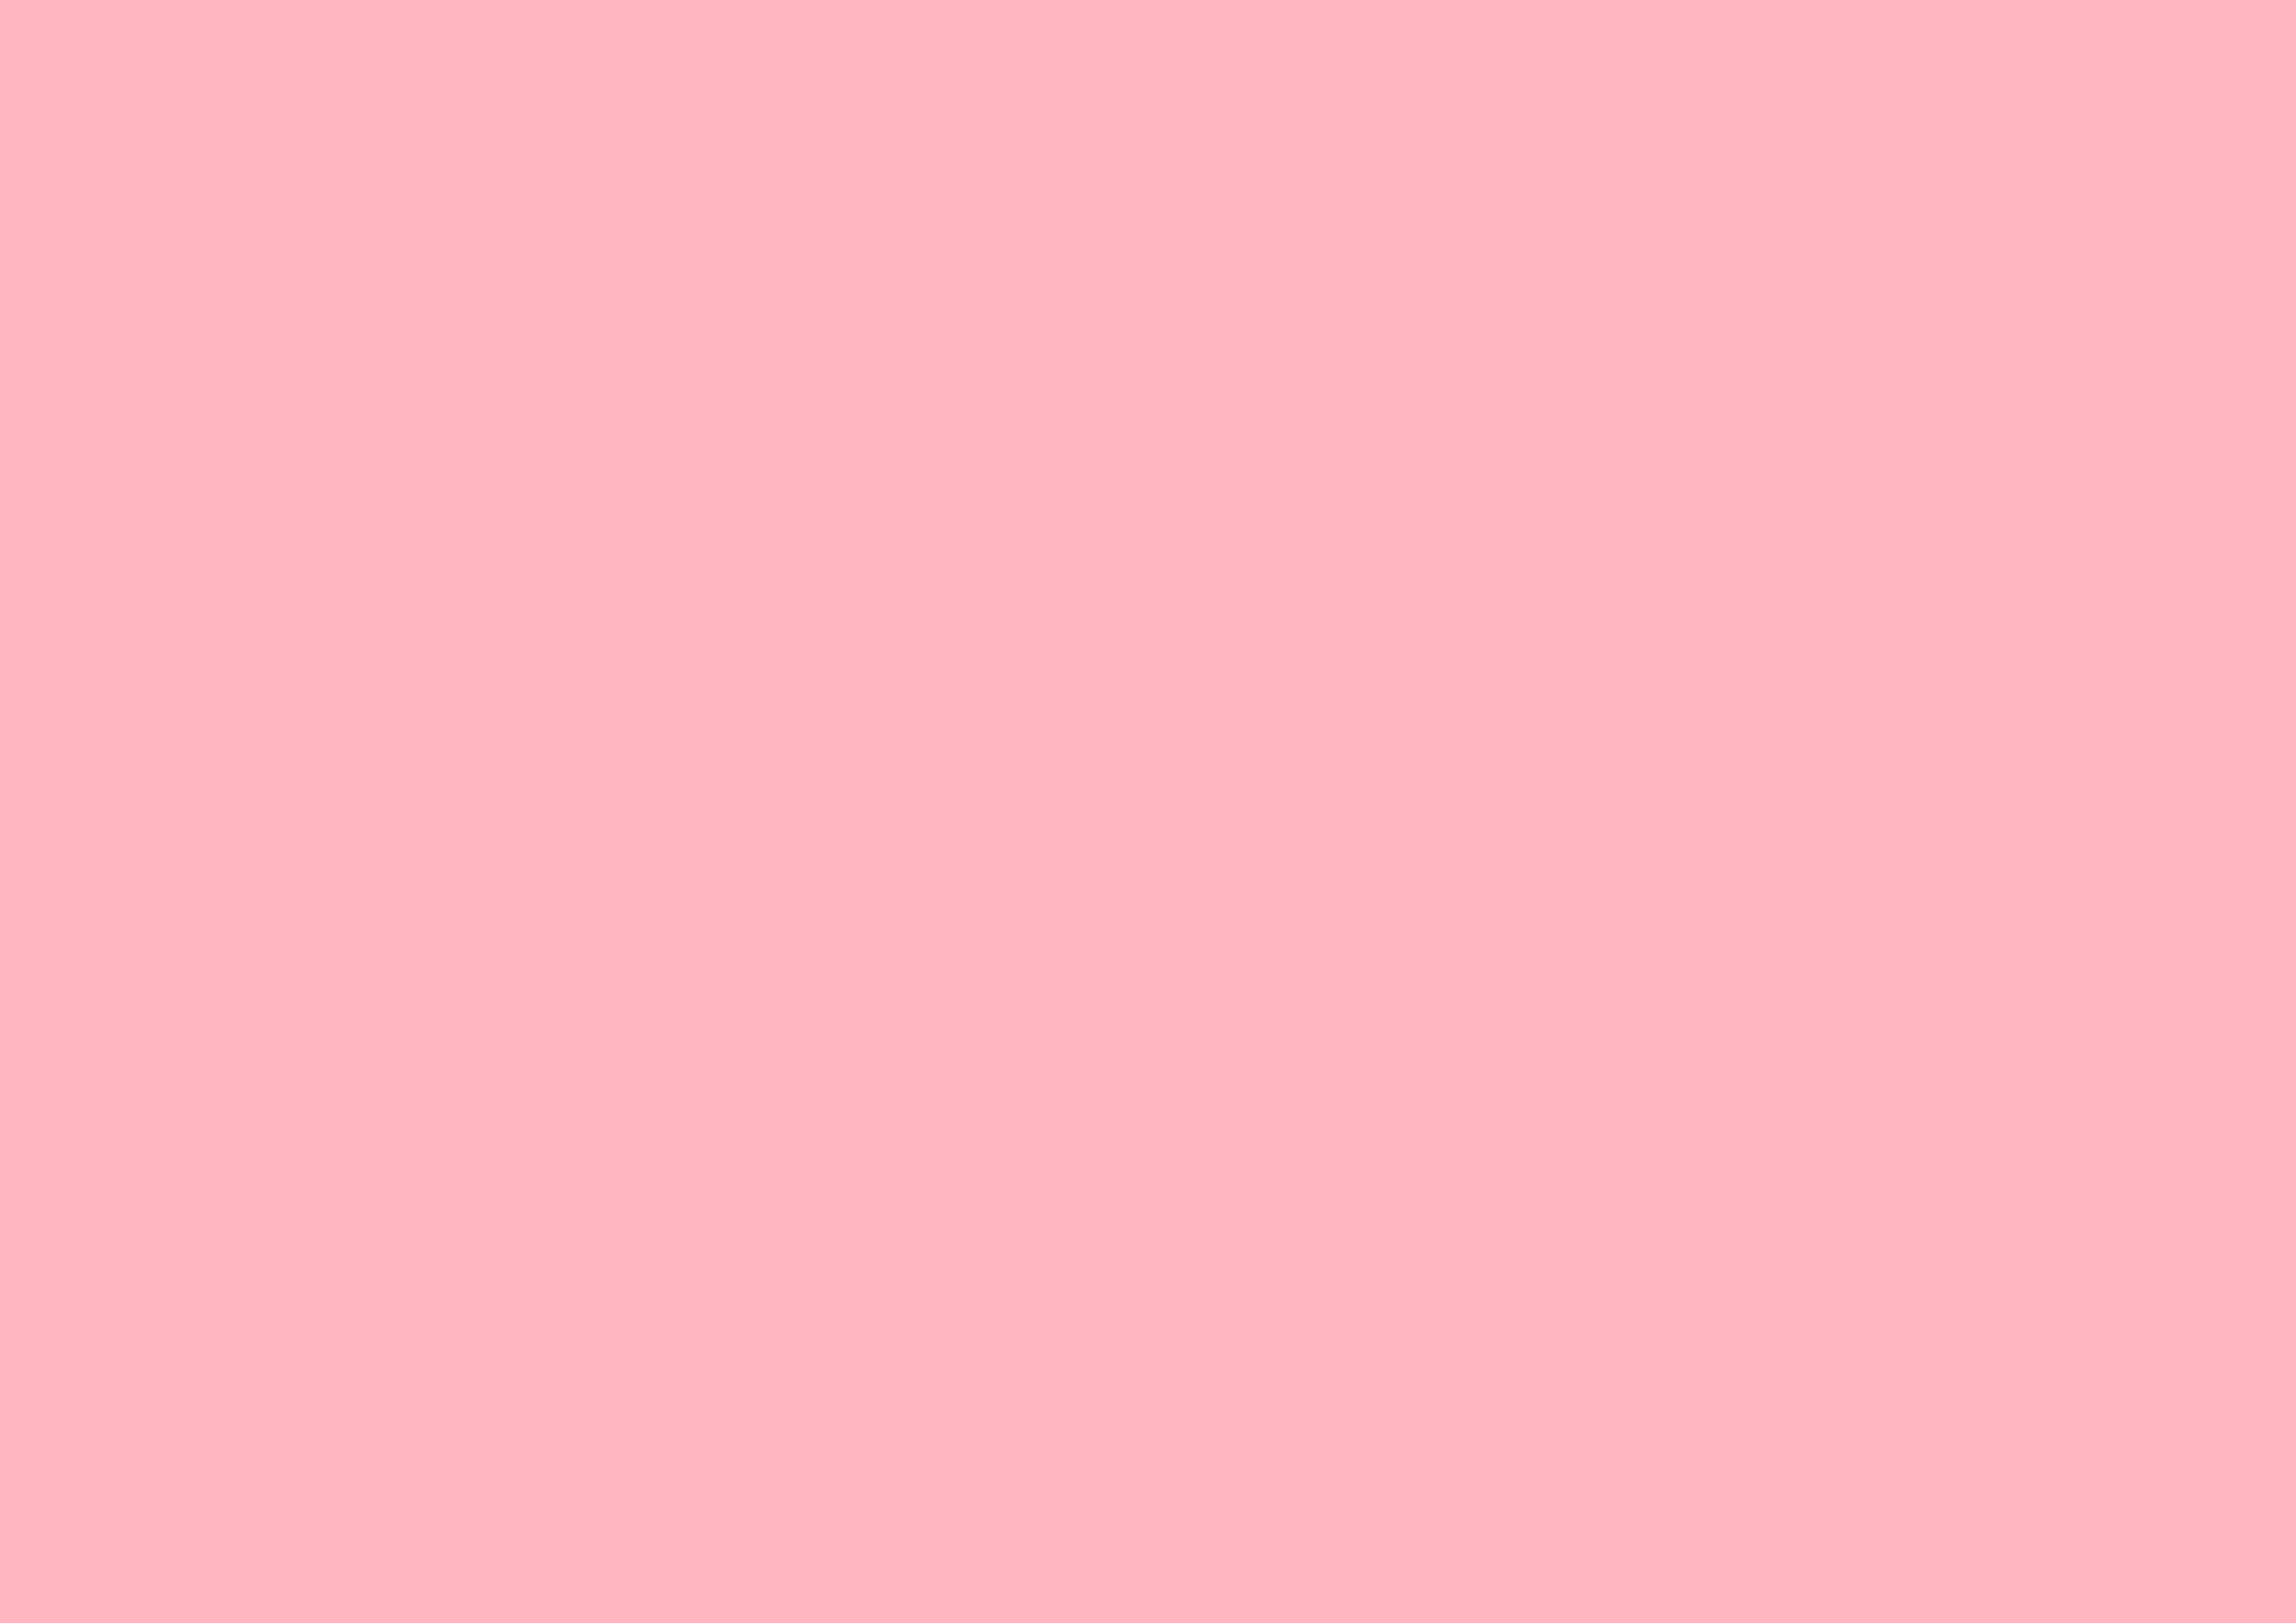 3508x2480 Light Pink Solid Color Background